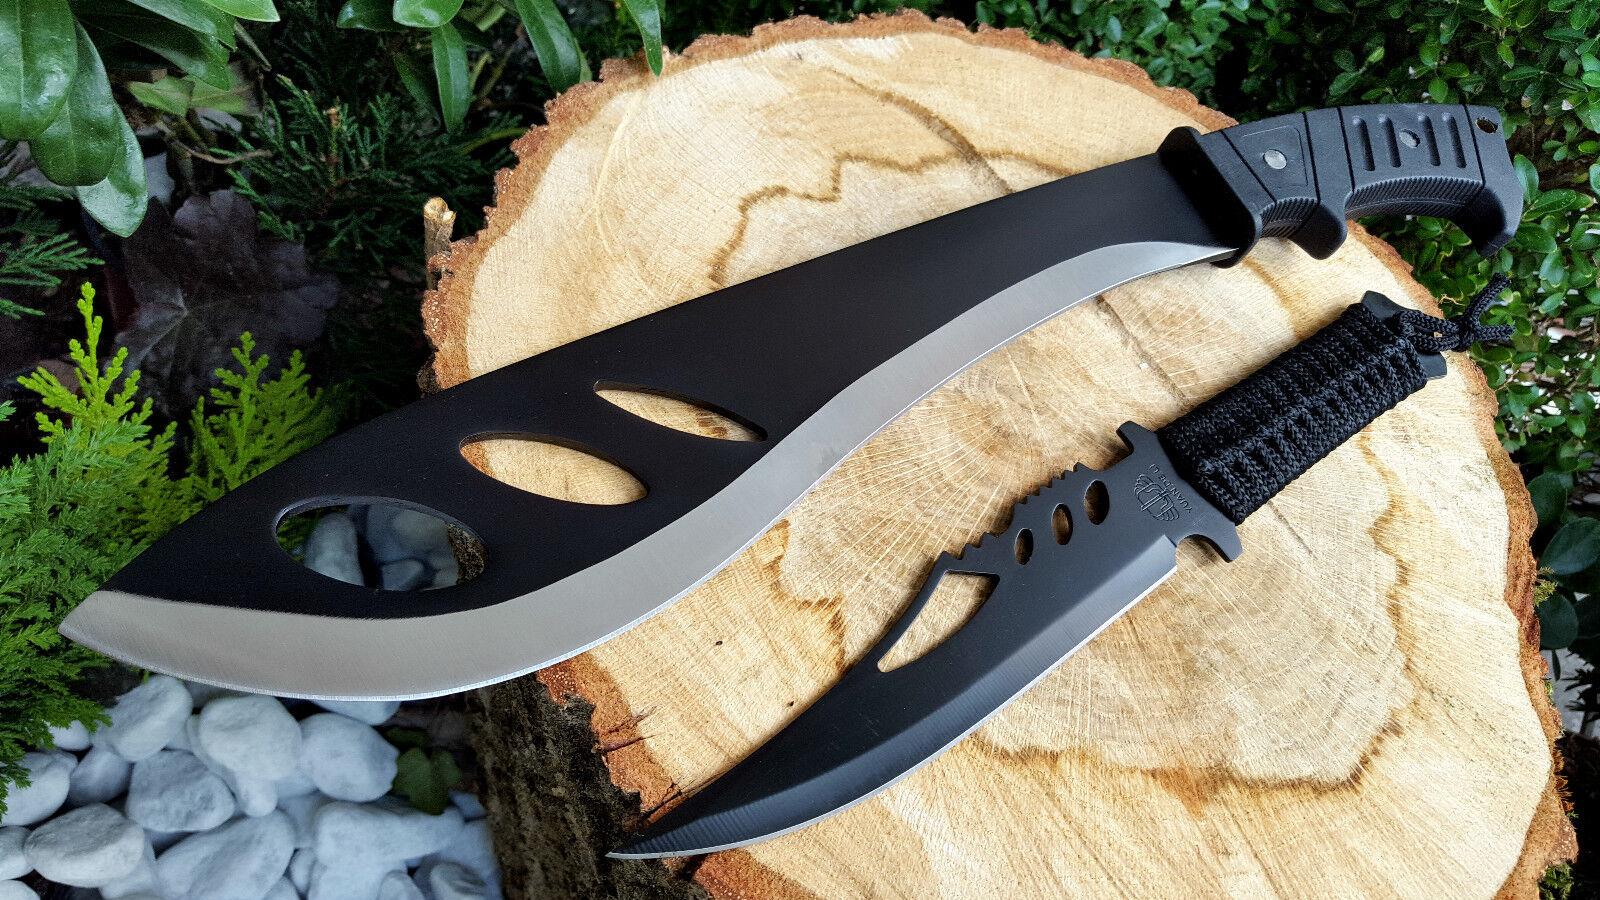 Machete +Messer Knife Bowie Buschmesser Coltello Hunting Macete Machette Couteau